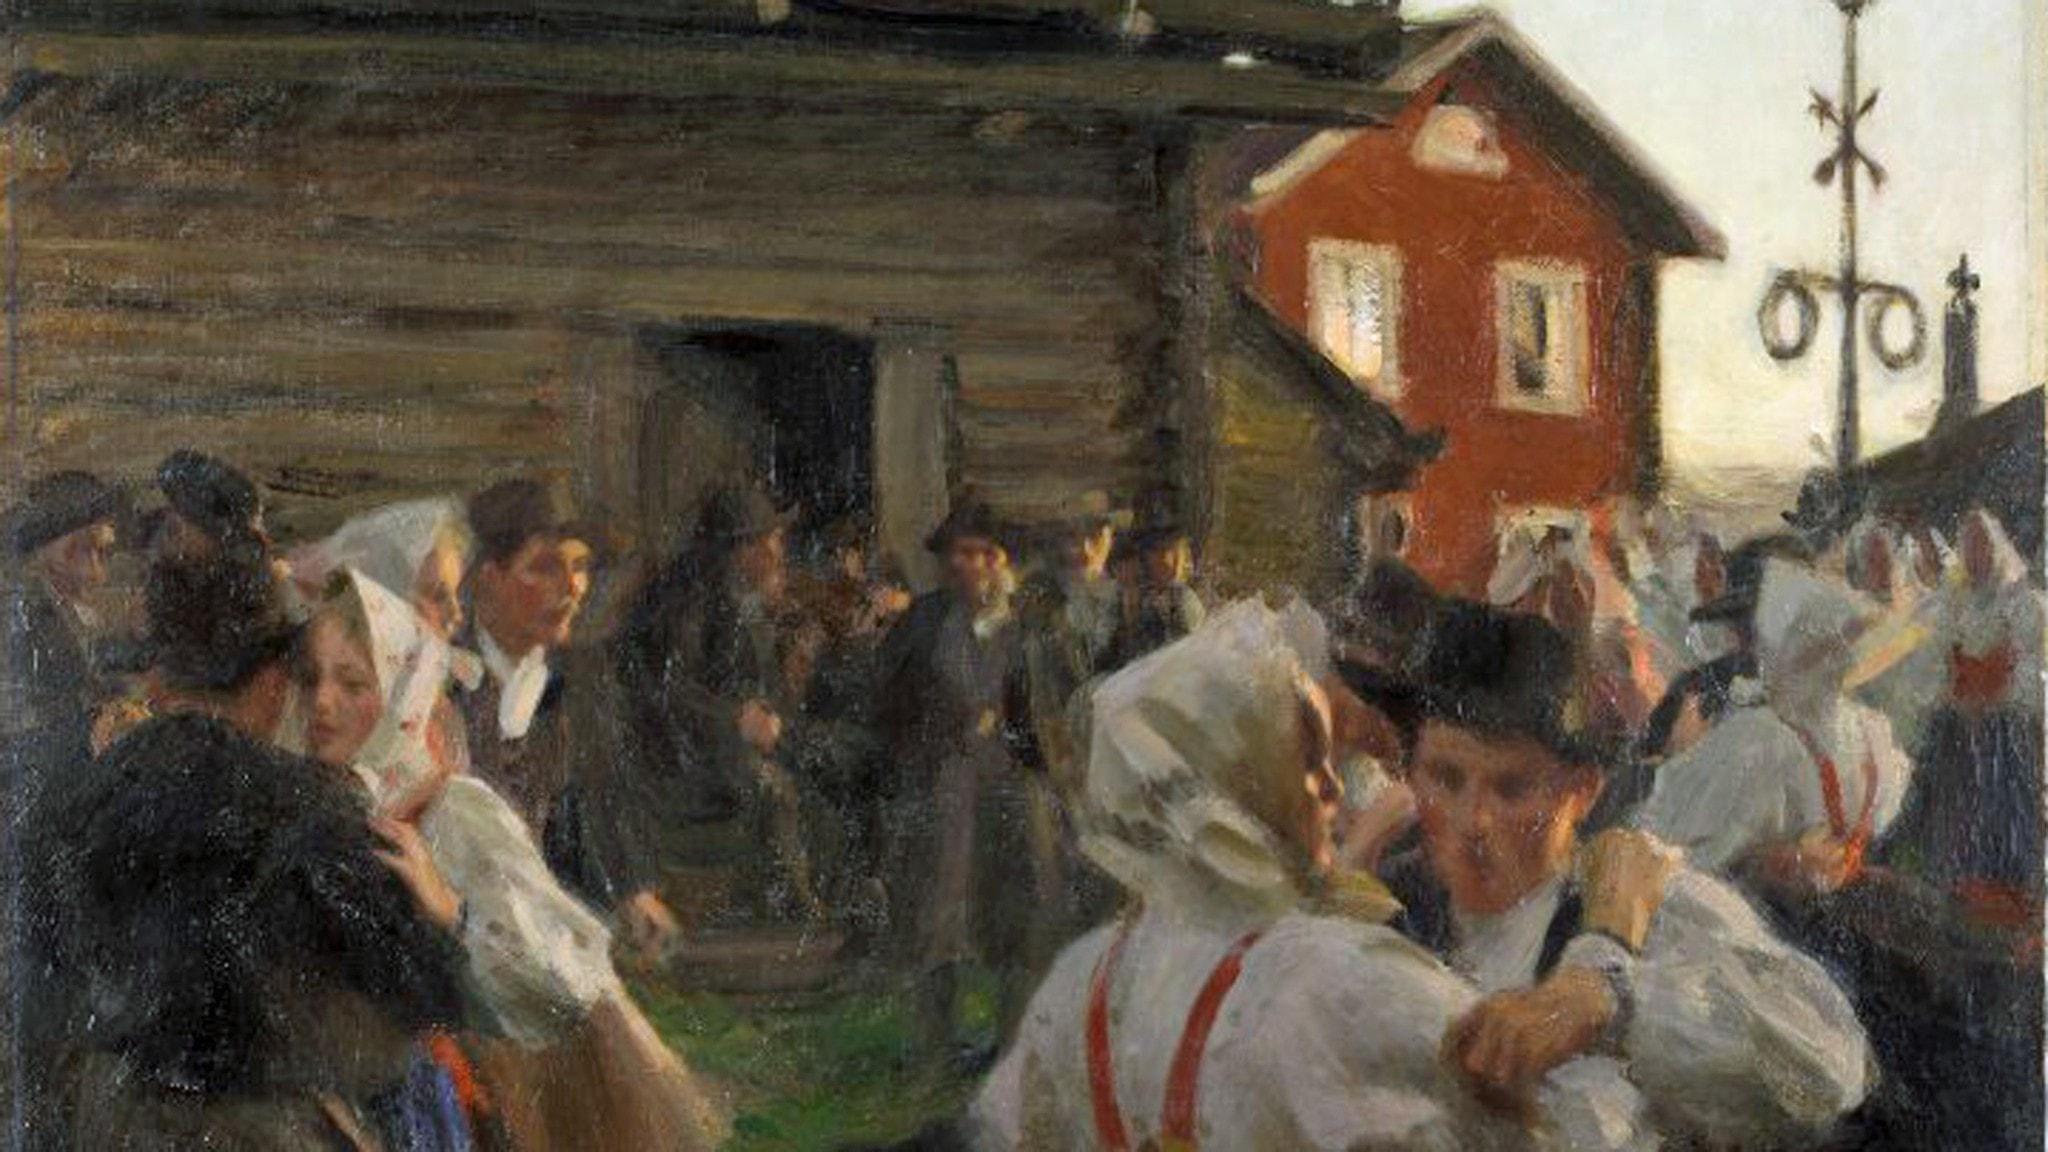 Anders Zorn, Midsommardans, 1897 Olja på duk (detalj)